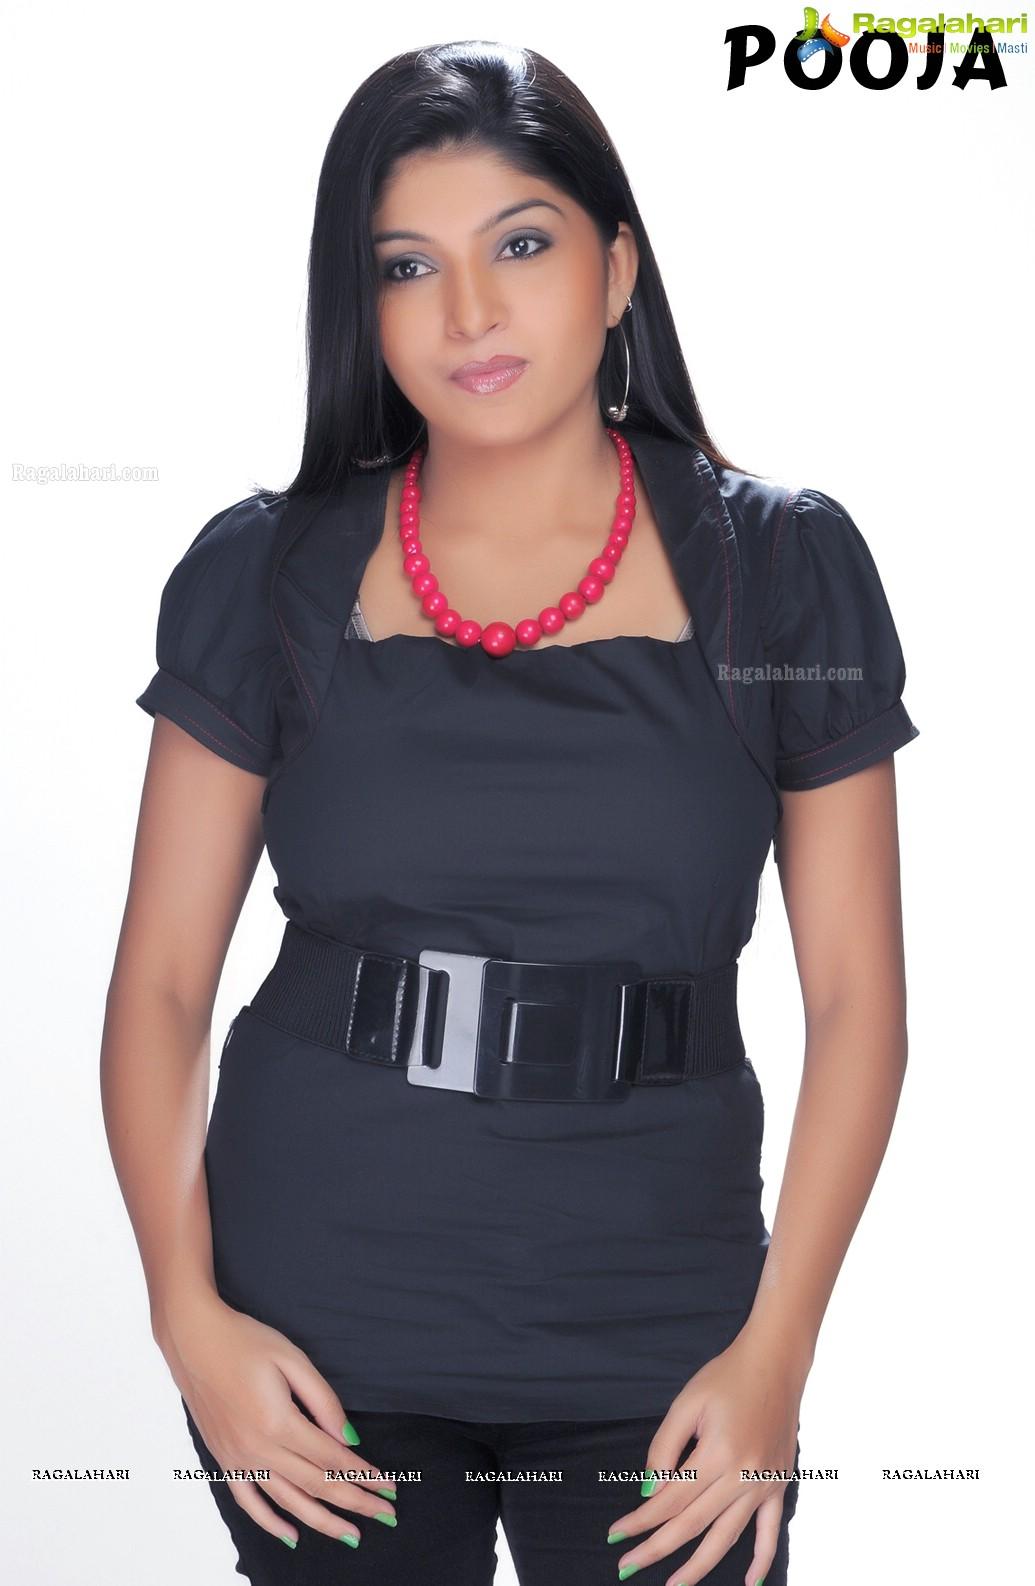 Pooja (Portfolio)